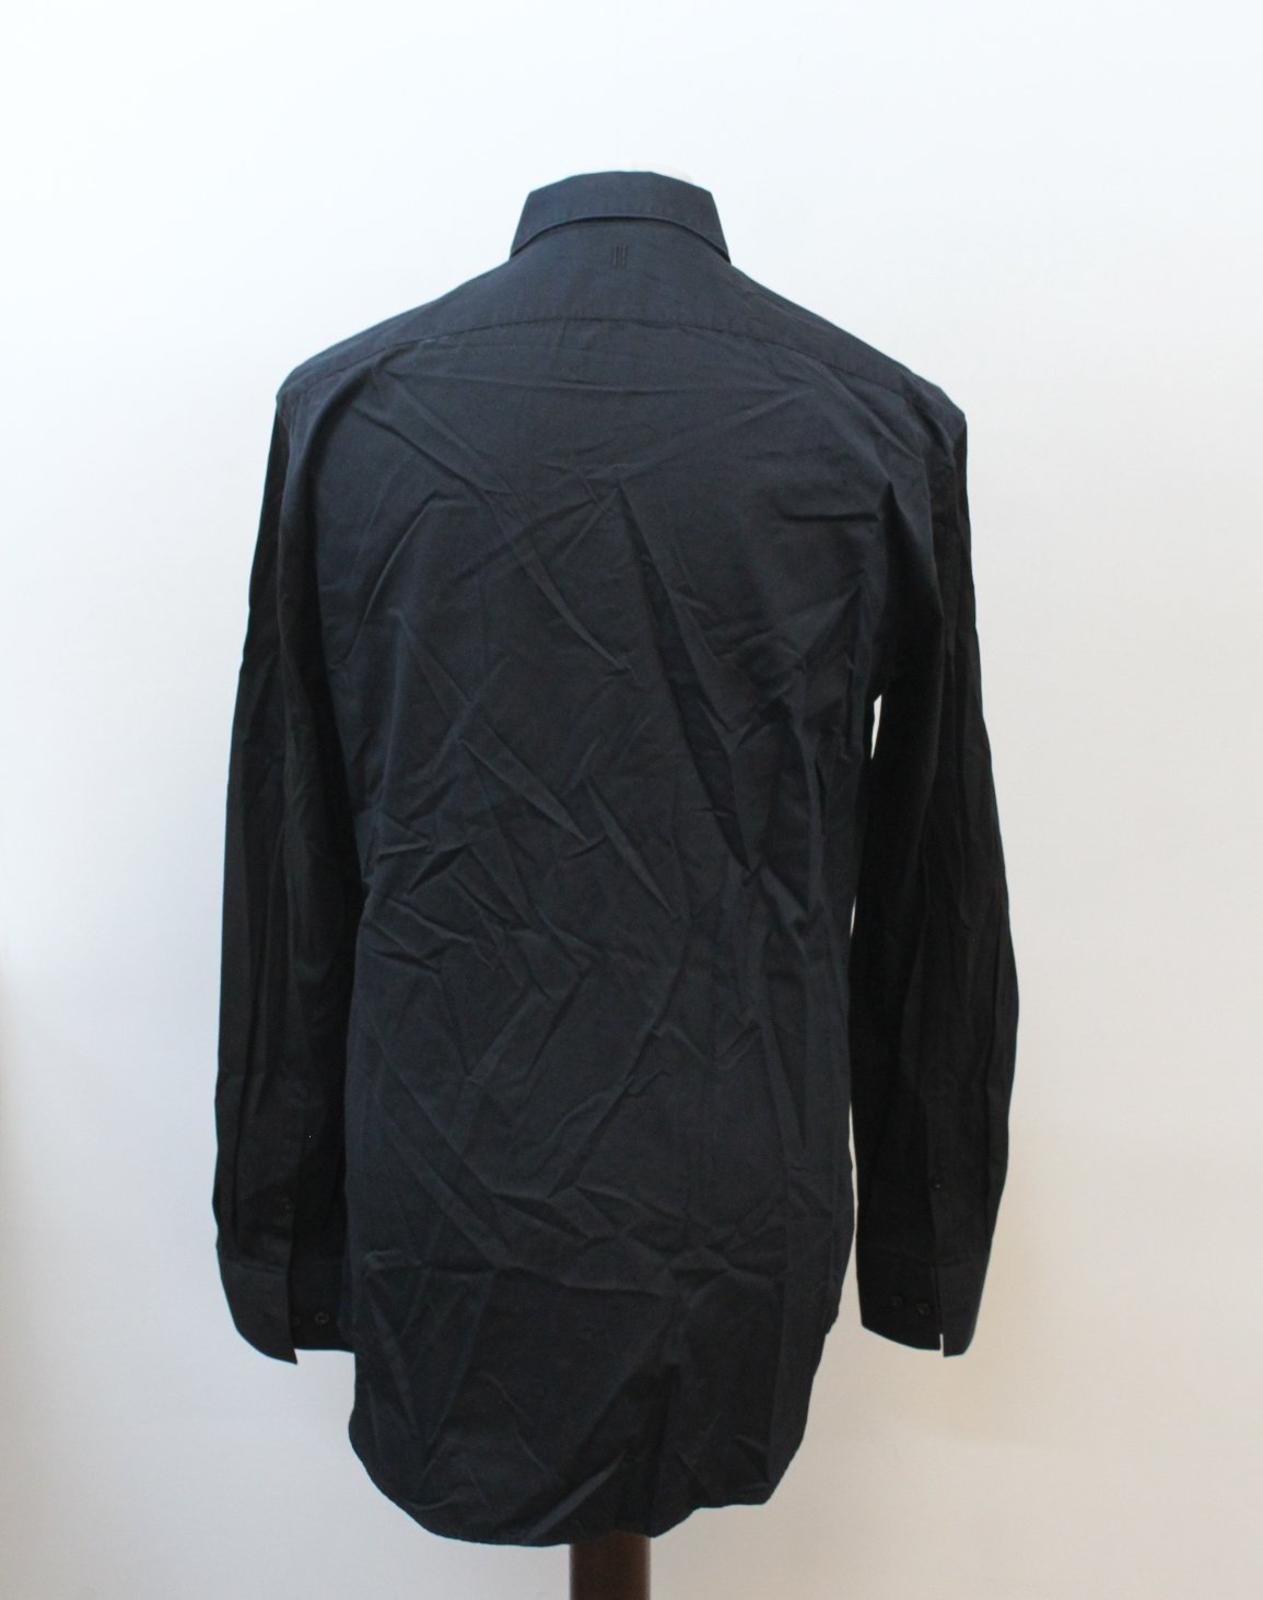 Neil-Barrett-Hombre-Azul-Manga-Negra-Cuello-Camisa-de-impresion-Corbata-Slim-Fit-16-5-034-42cm miniatura 5